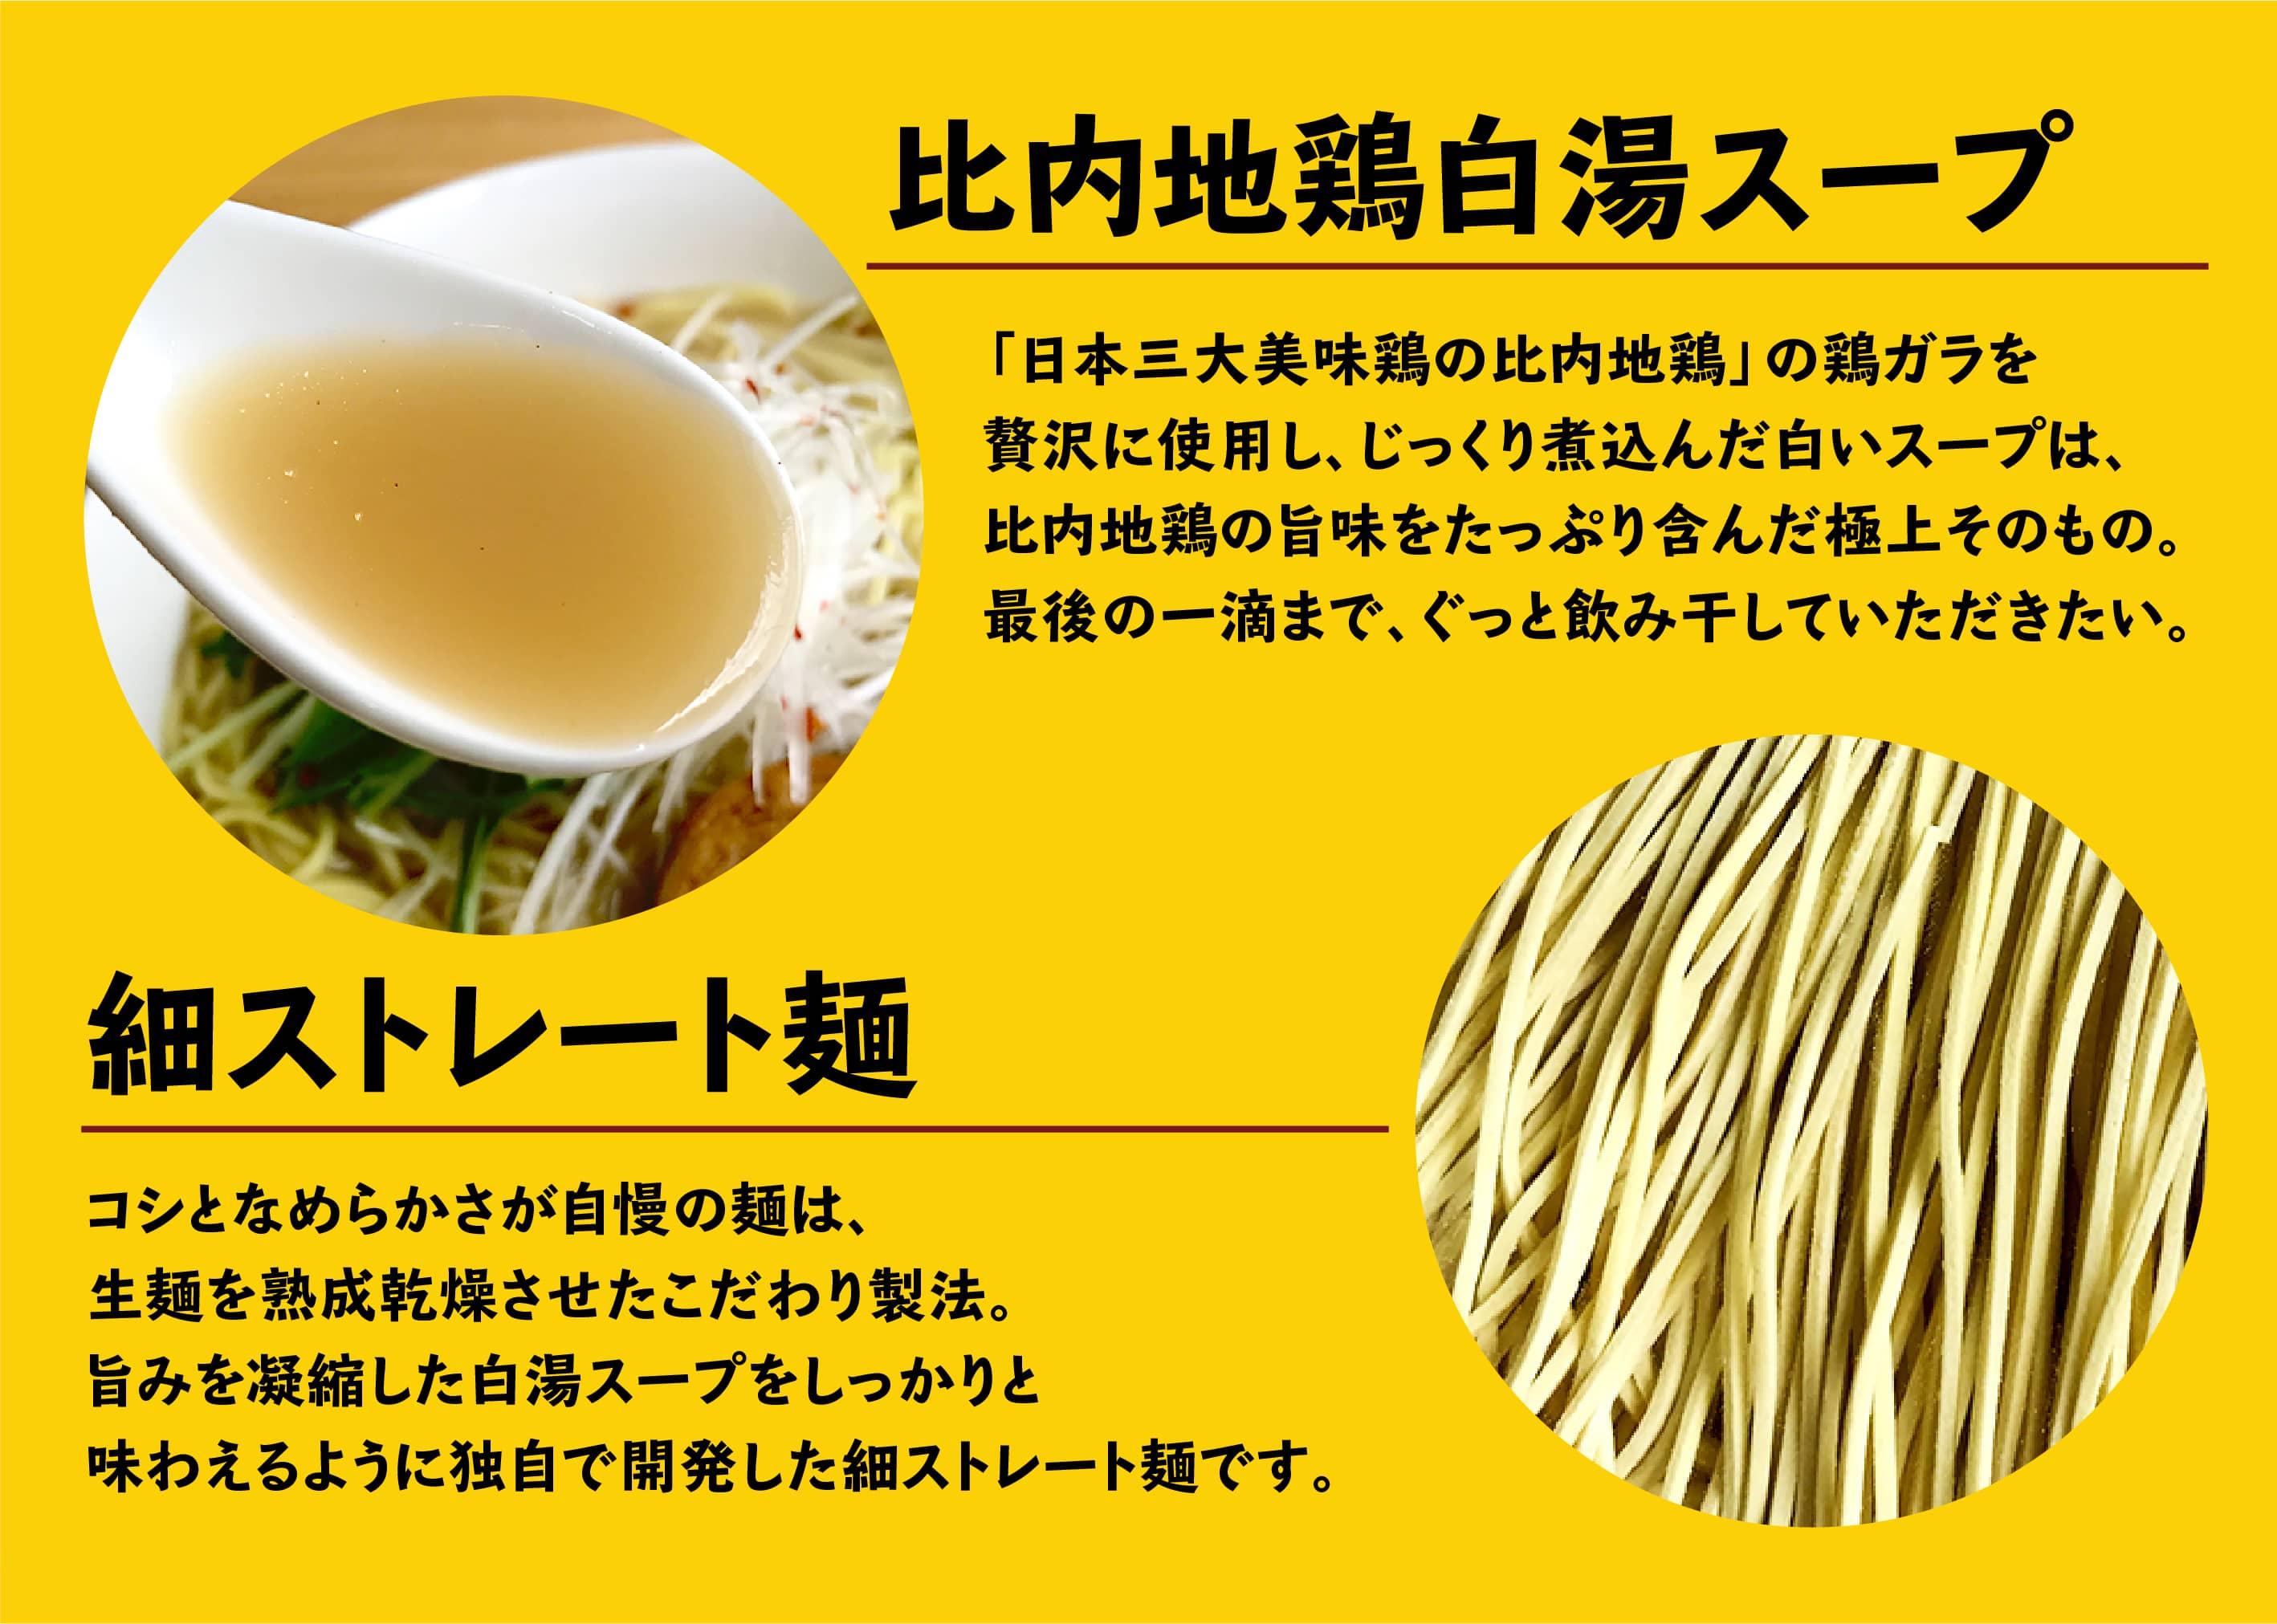 UMAMY[ウマミー] 比内地鶏白湯ラーメン 醤油味